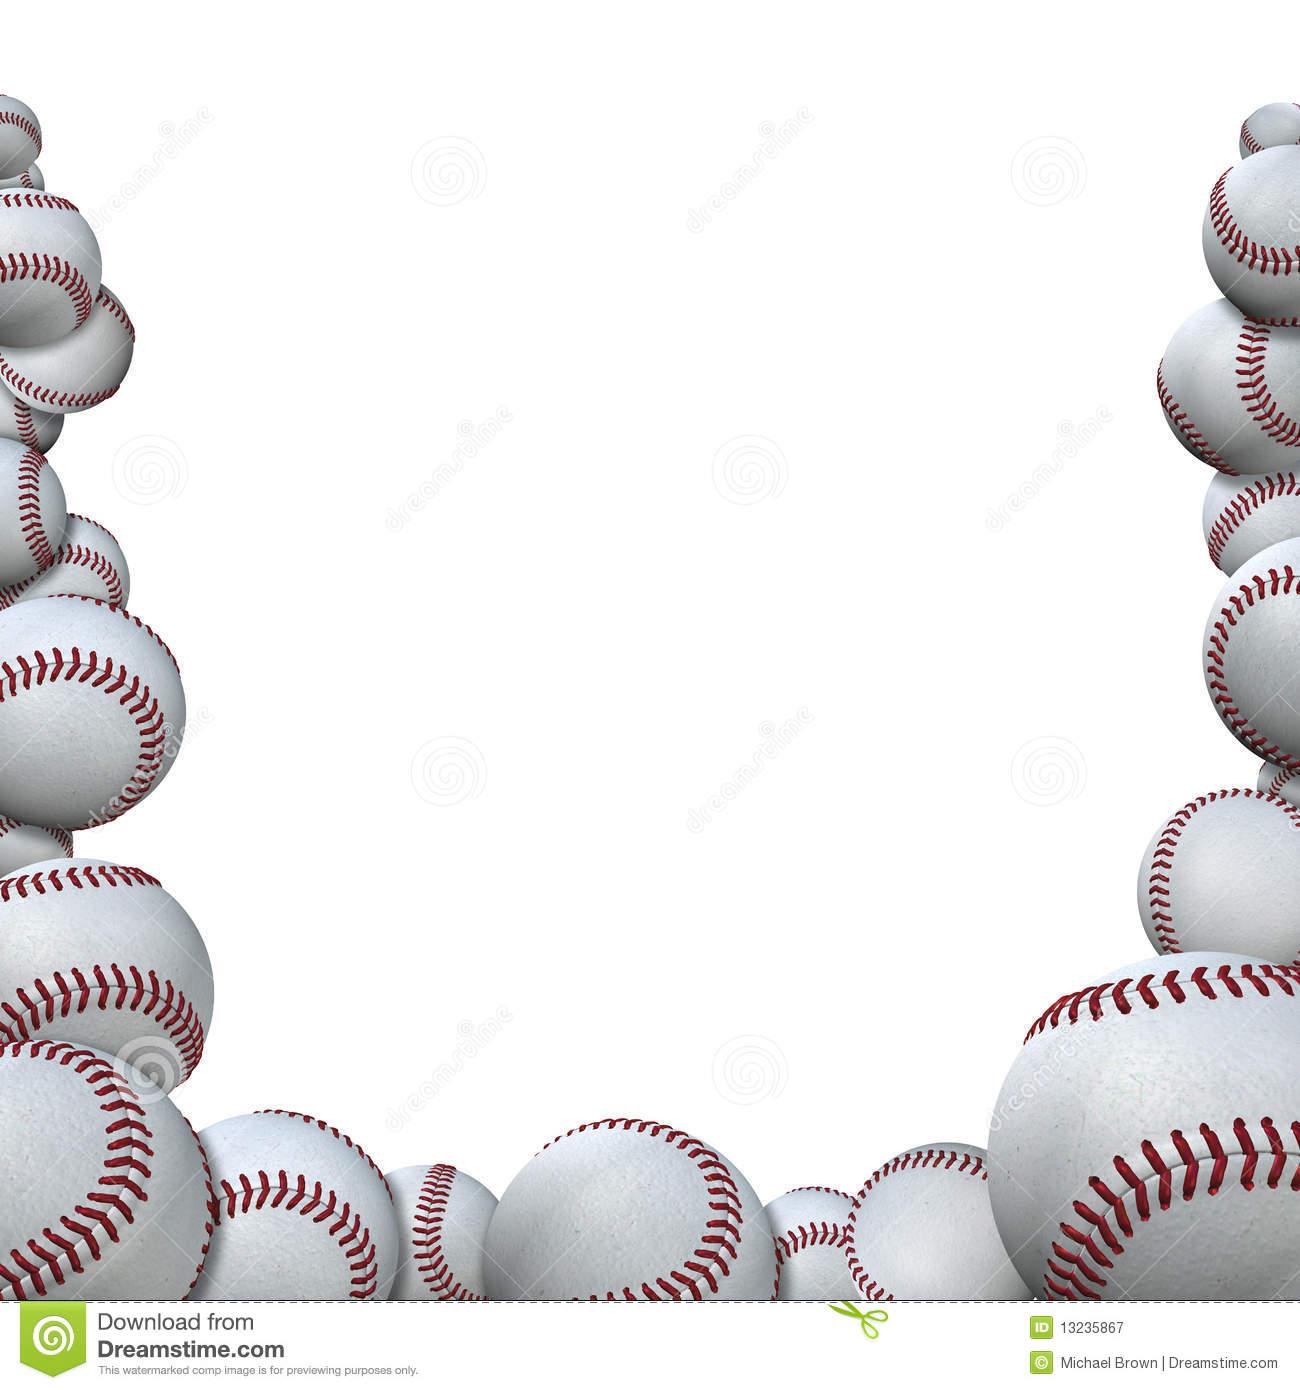 Many Baseballs Form Baseball Season Sports Border Royalty Free Stock